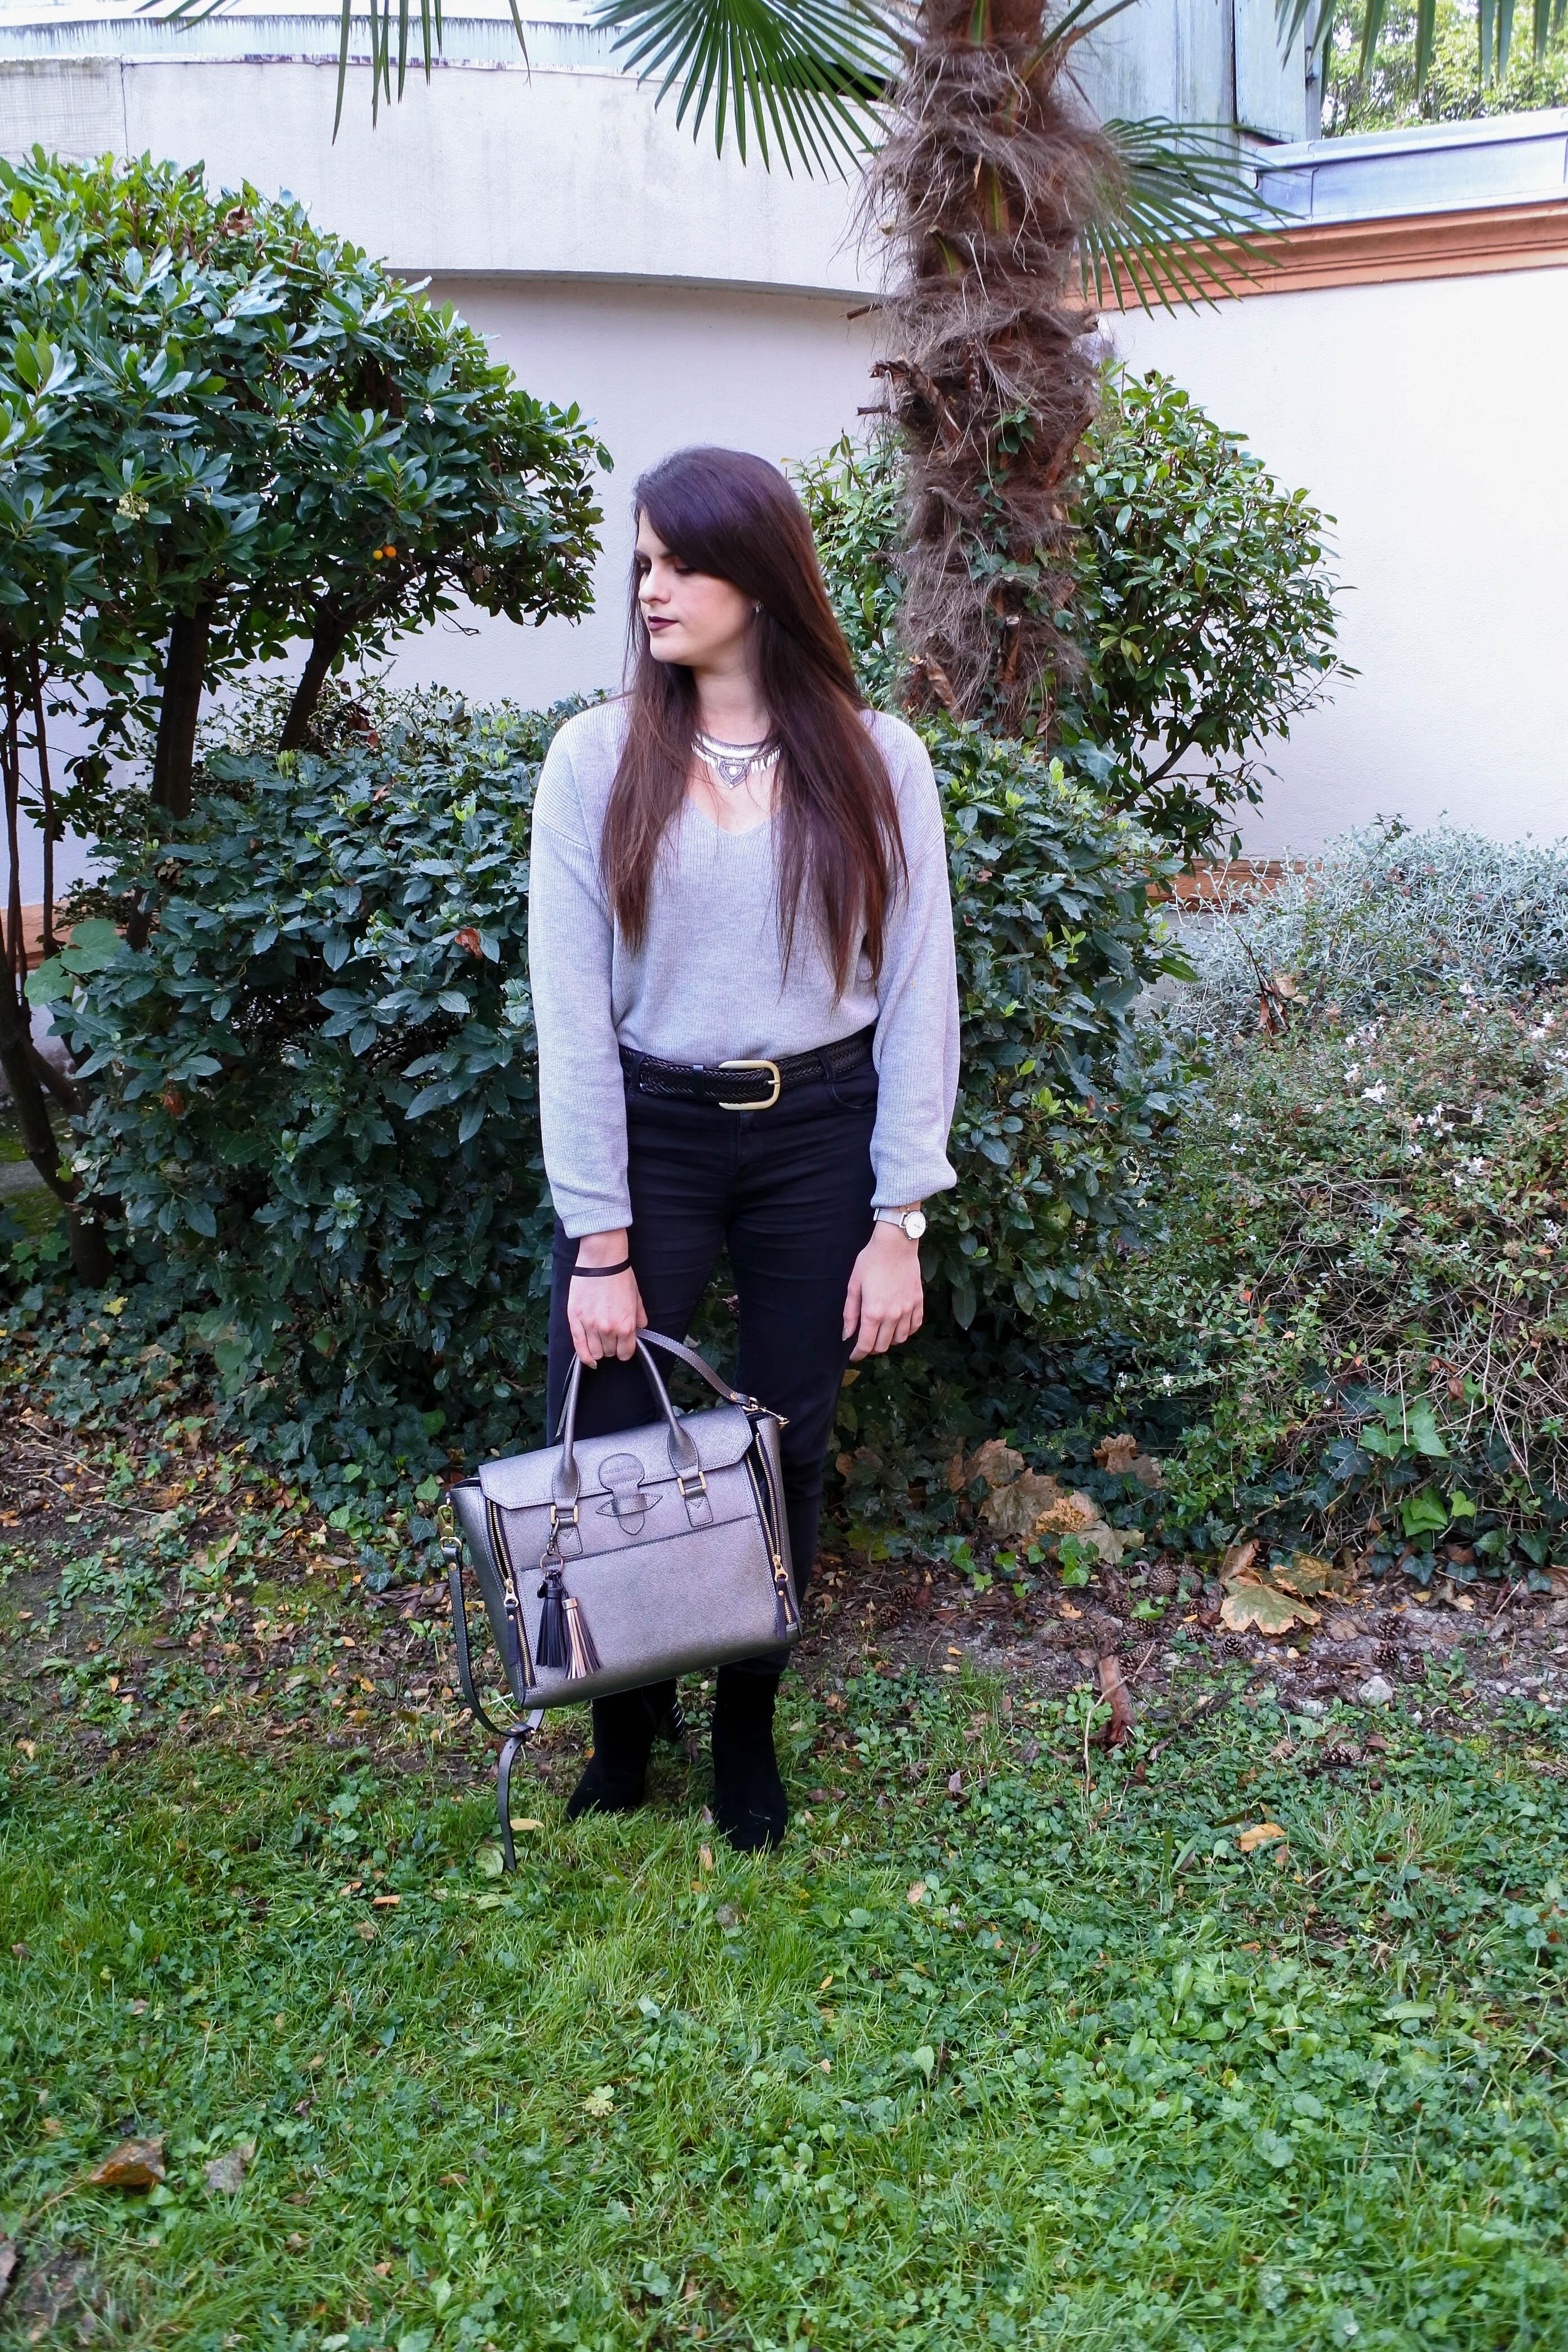 Manteau bordeaux & sac métallisé look tendance clémence blog mode toulouse